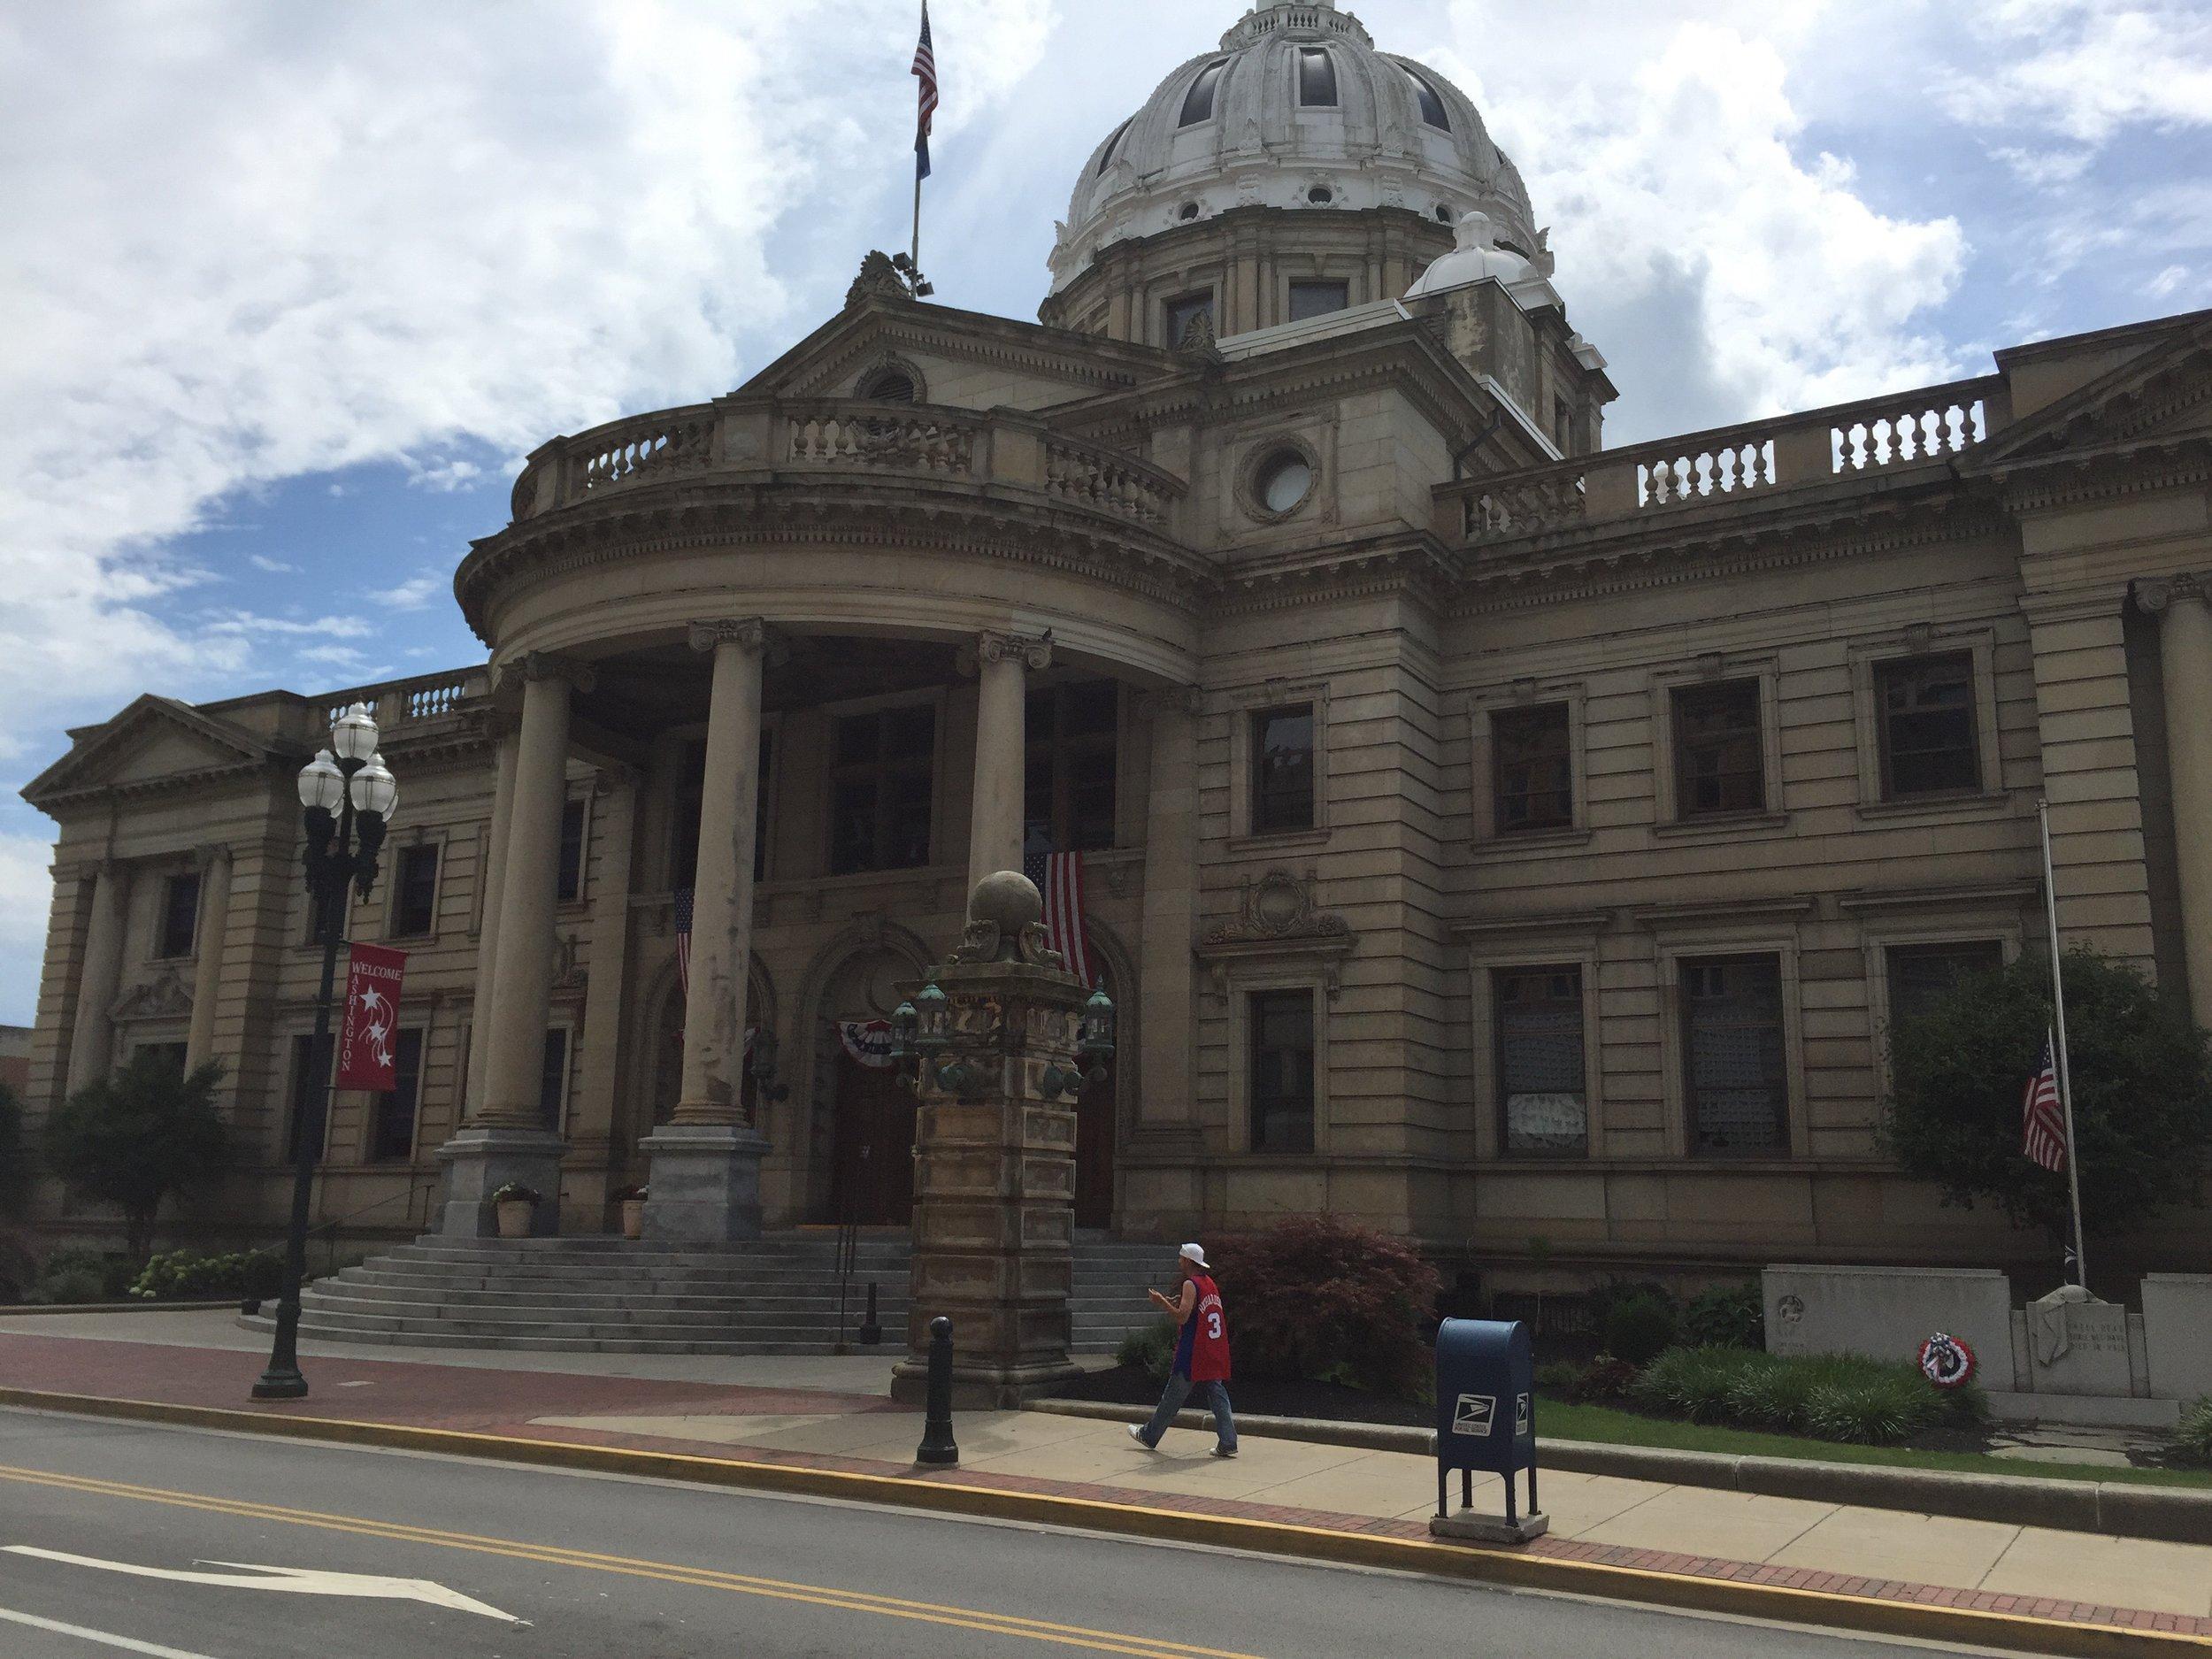 Washington County Courthouse, Washington, Pa.